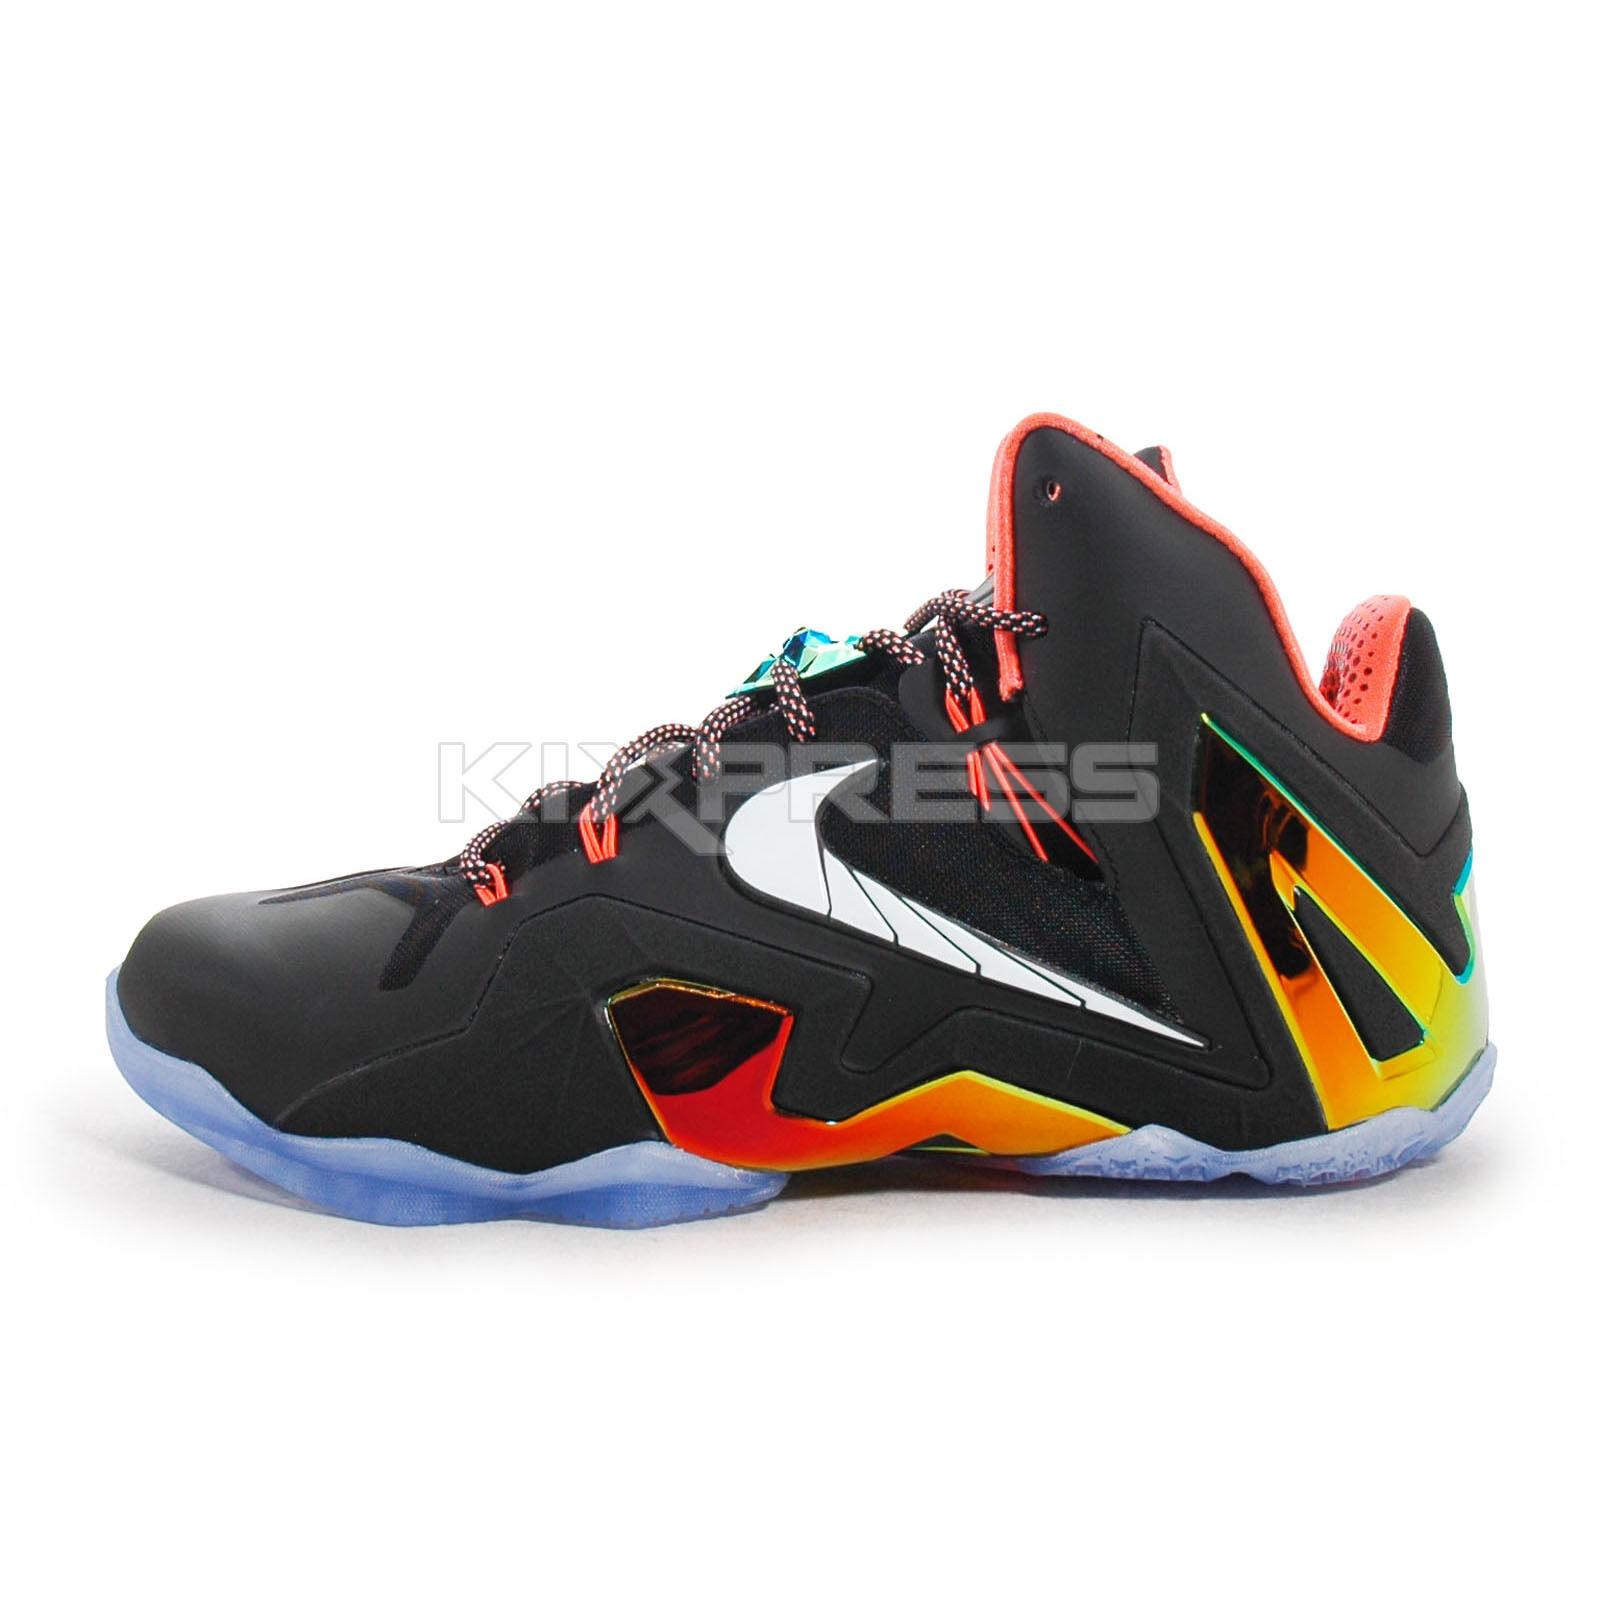 on sale d6aa5 6e2d4 Nike Lebron XI Elite  642846-002  Basketball Black White-Gold-